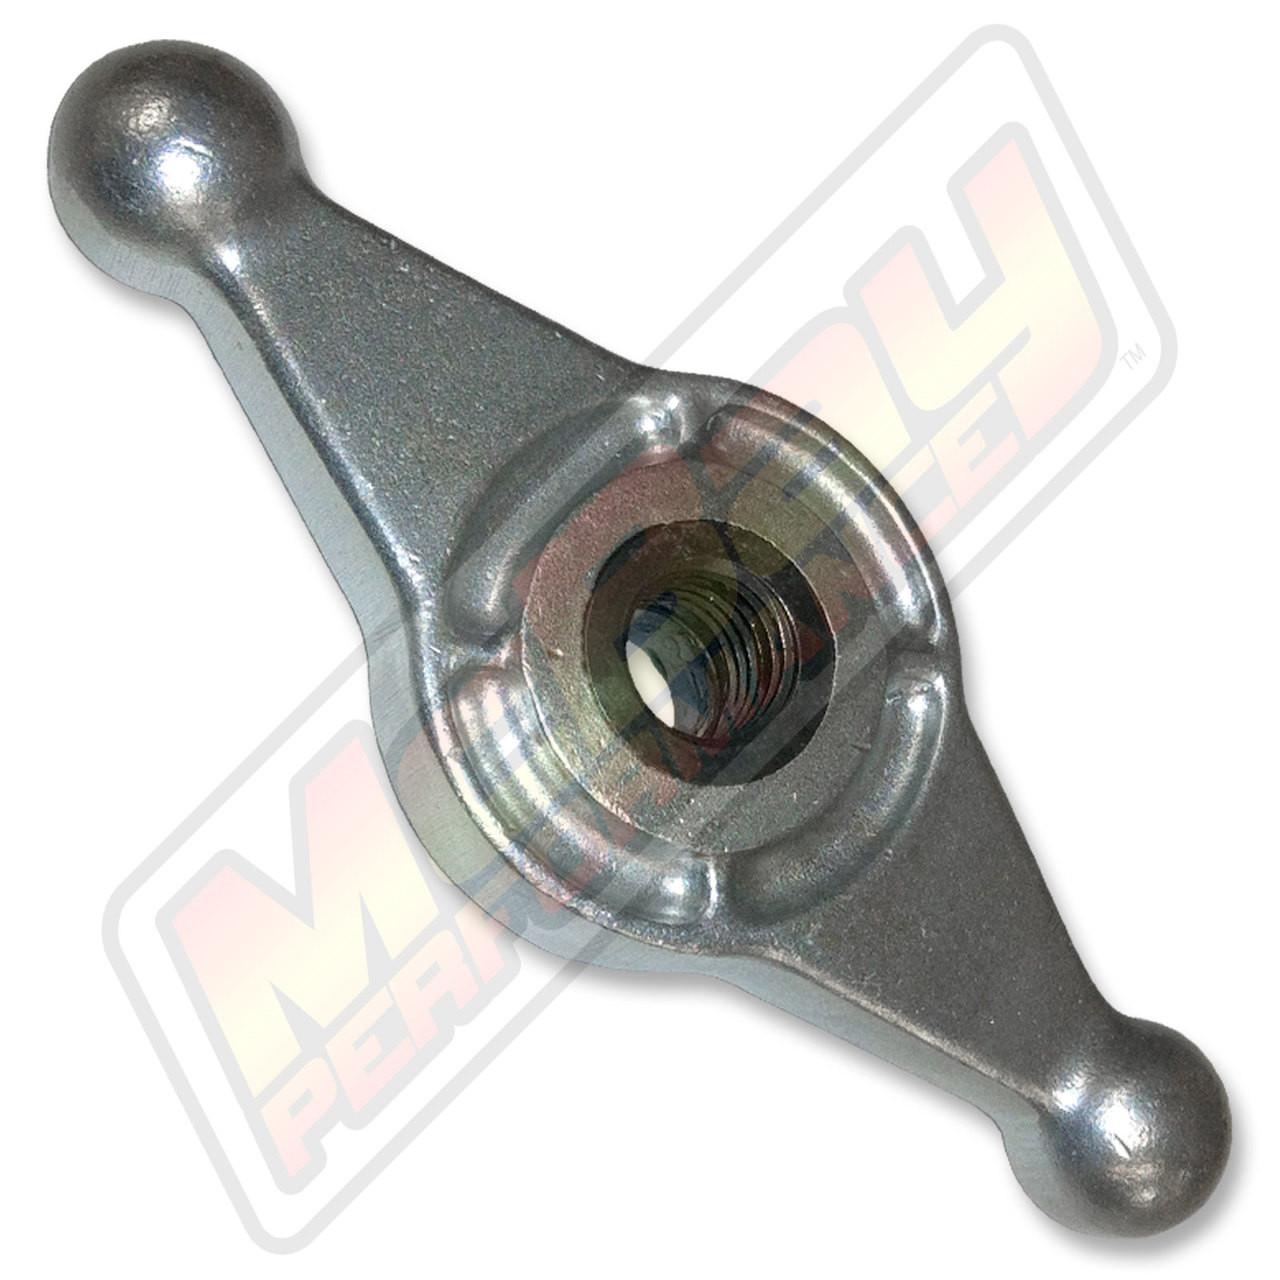 7543 - Coats Wheel Balancer 28MM Shaft Manual Hub Wing Nut    McBay Performance